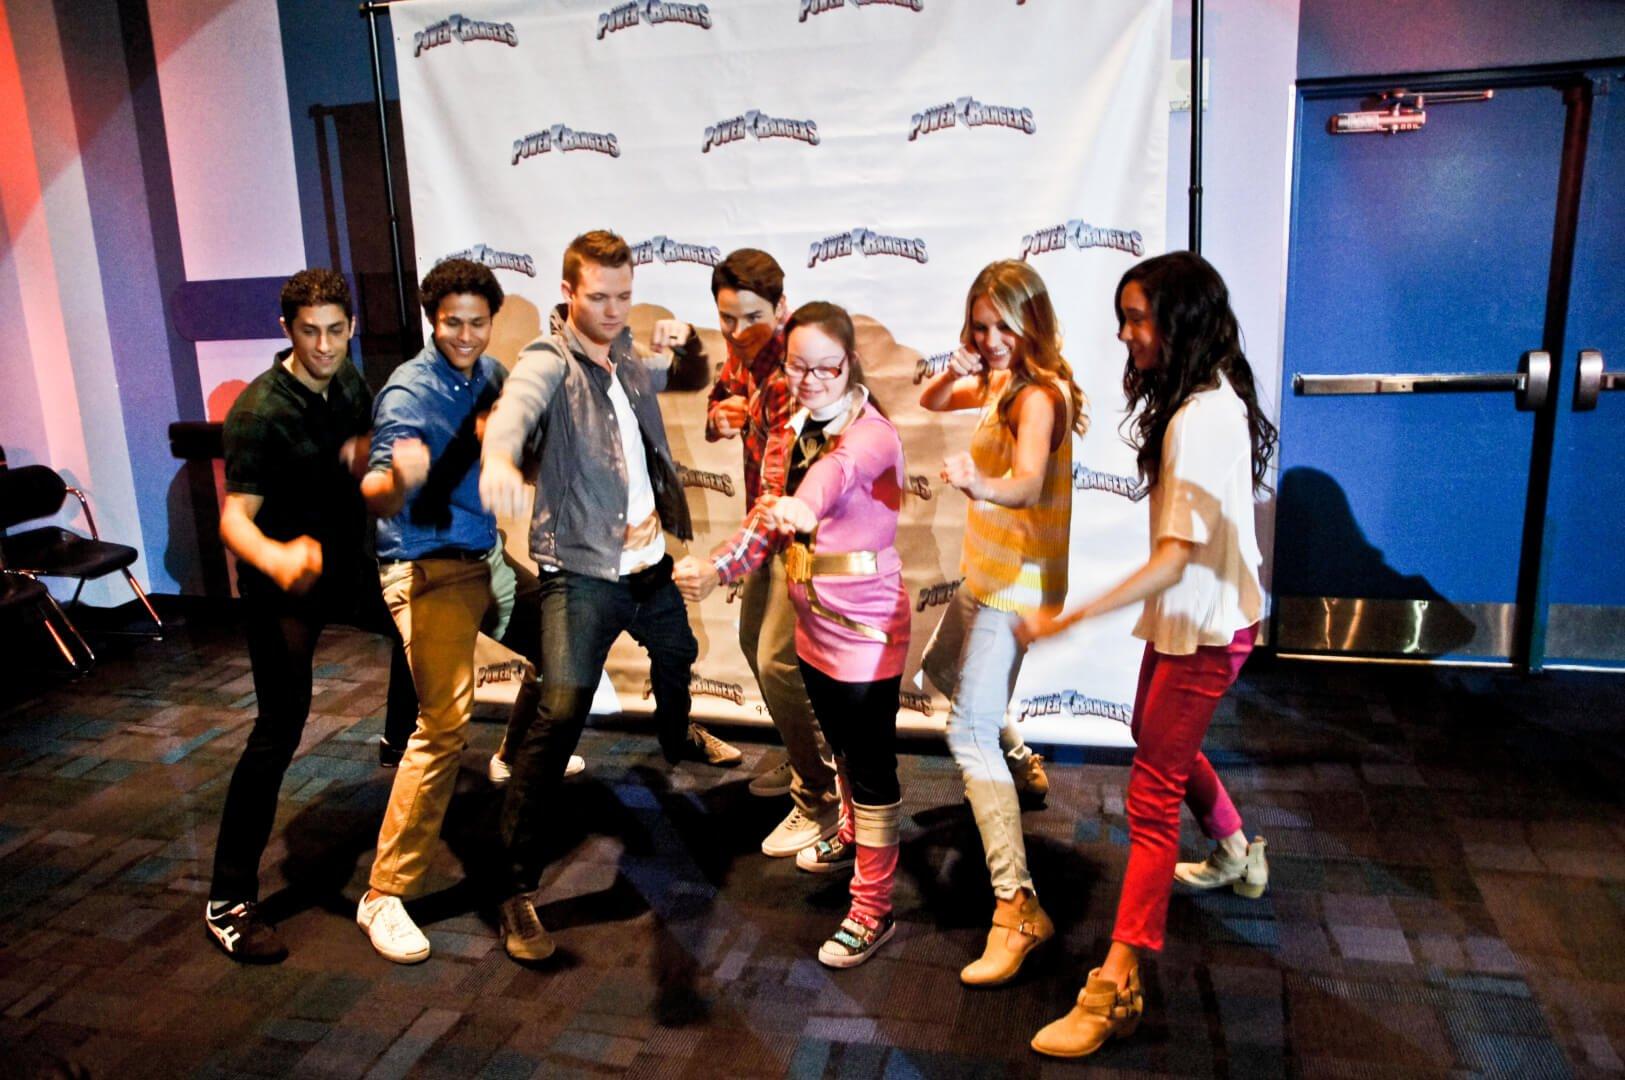 Nick Hotel hosts Power Rangers Super Megaforce weekends in Orlando ...